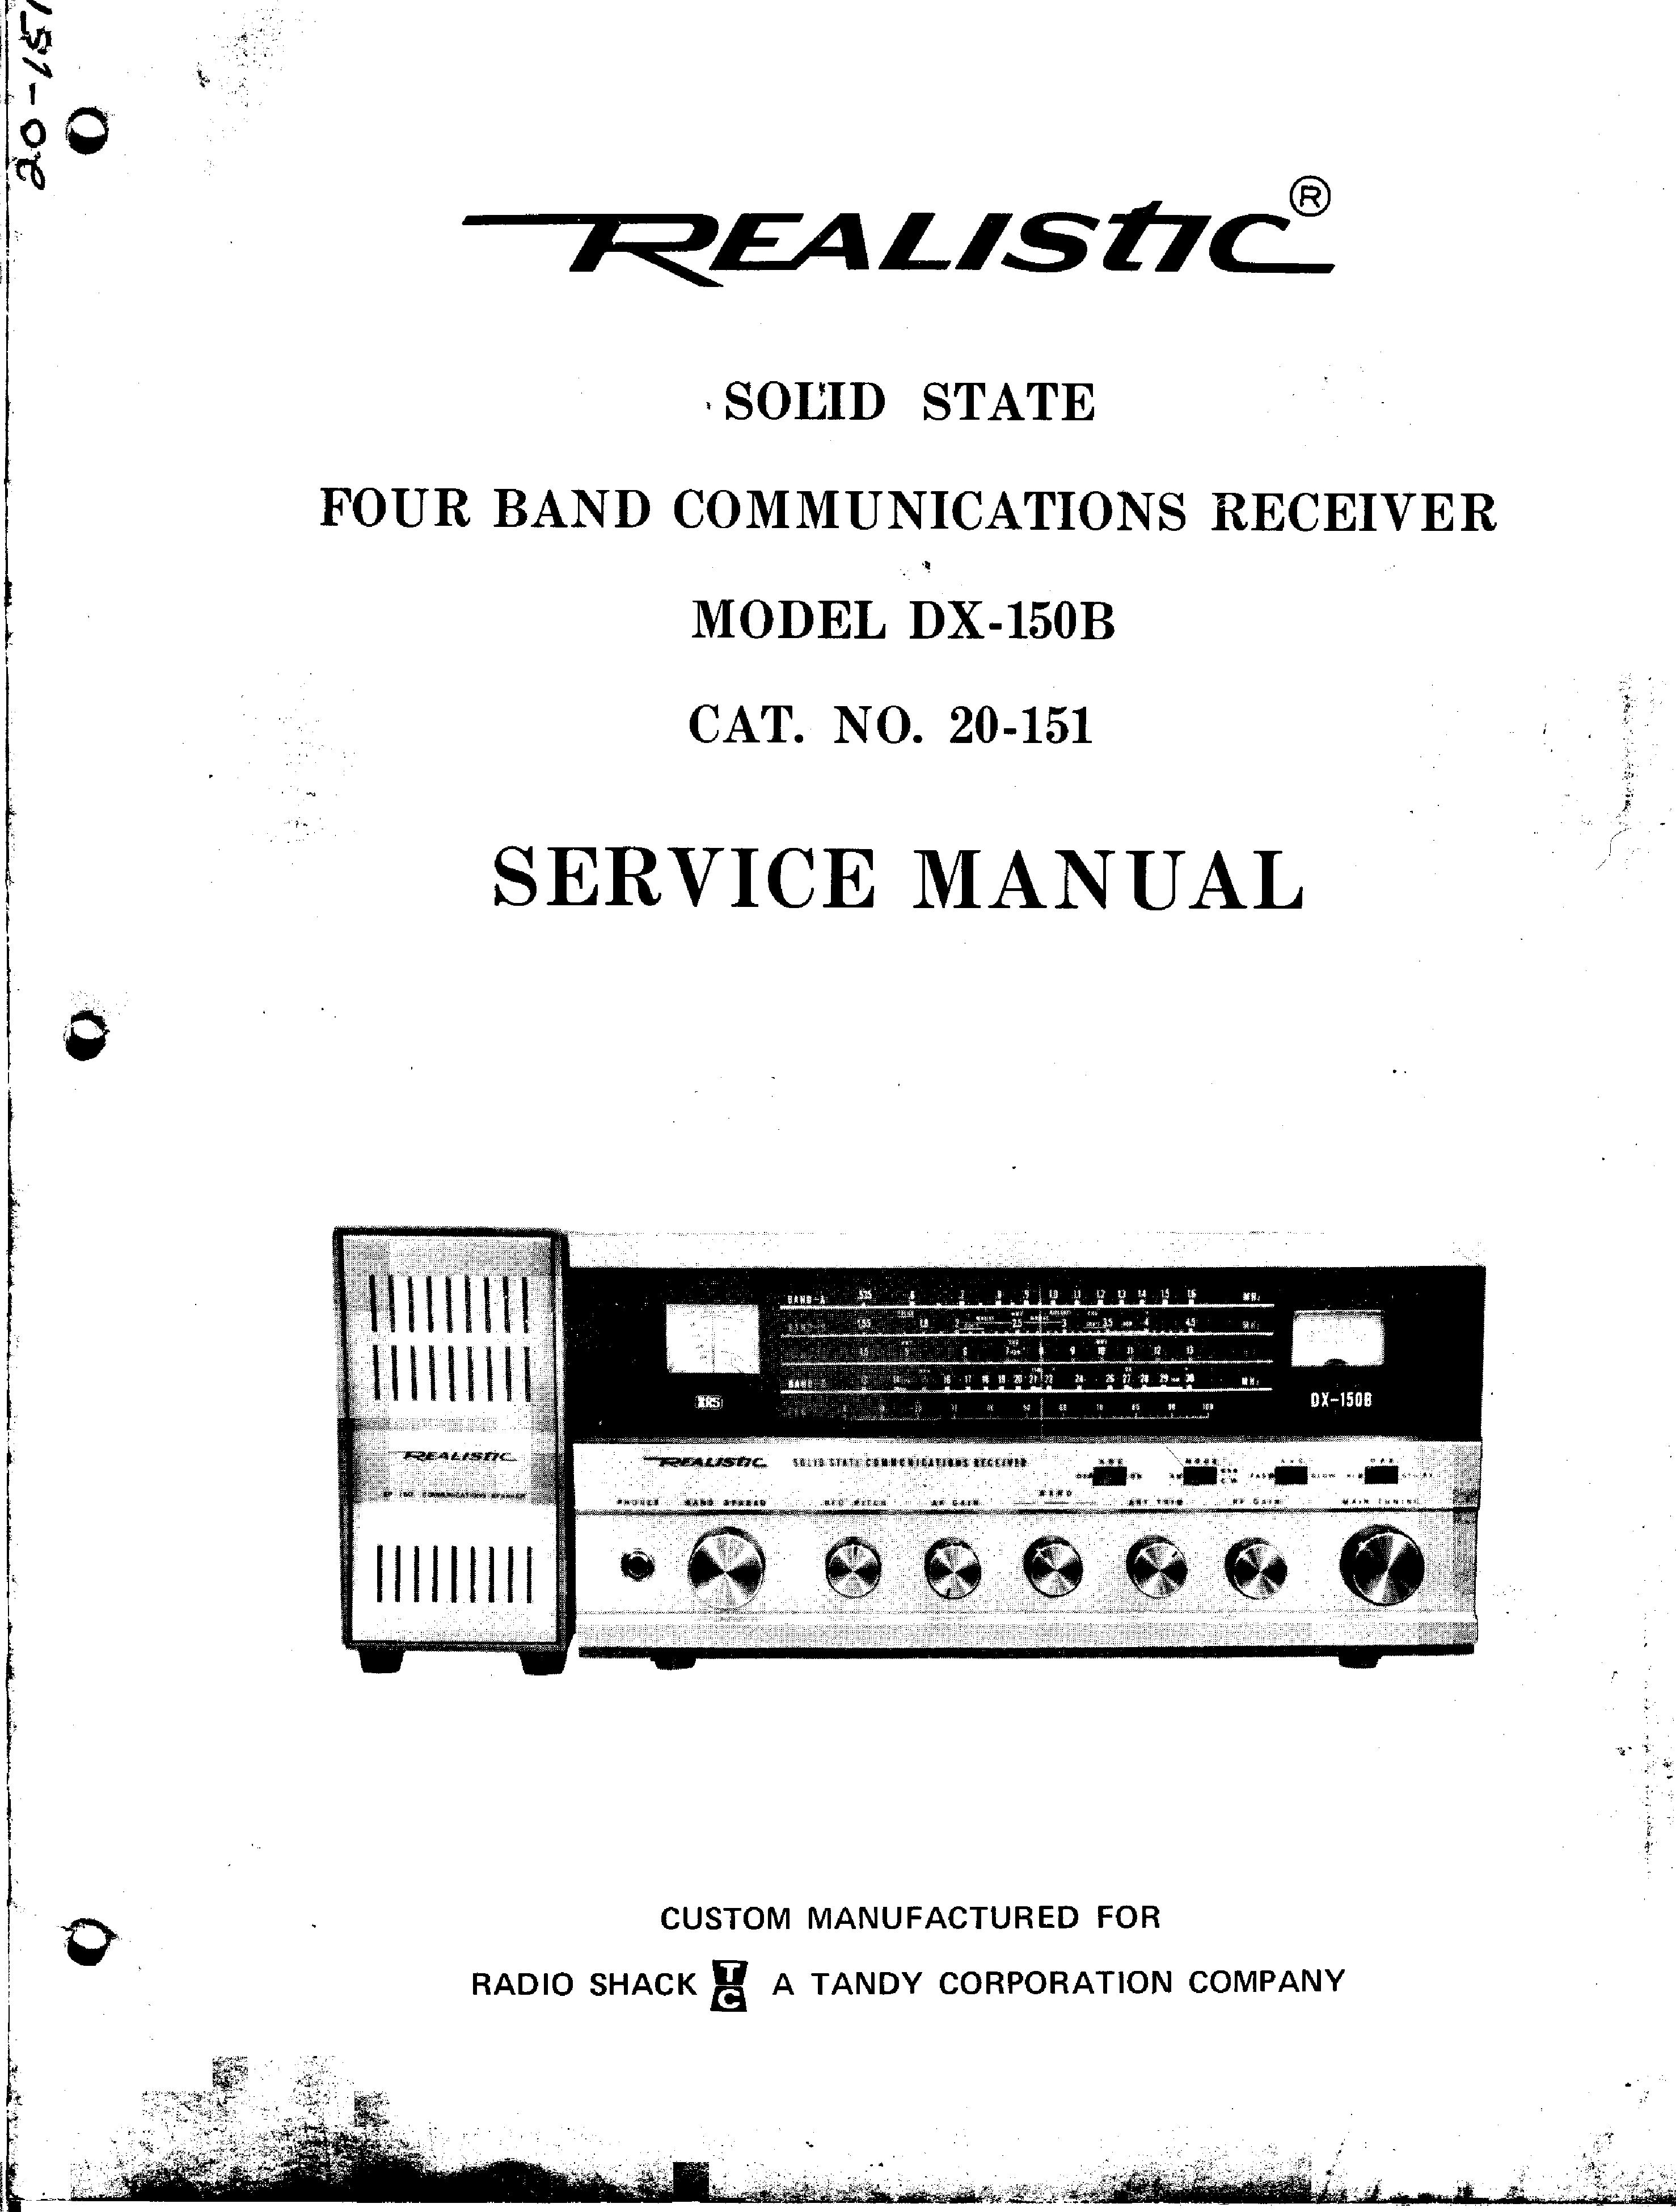 realistic sa-1001 service manual